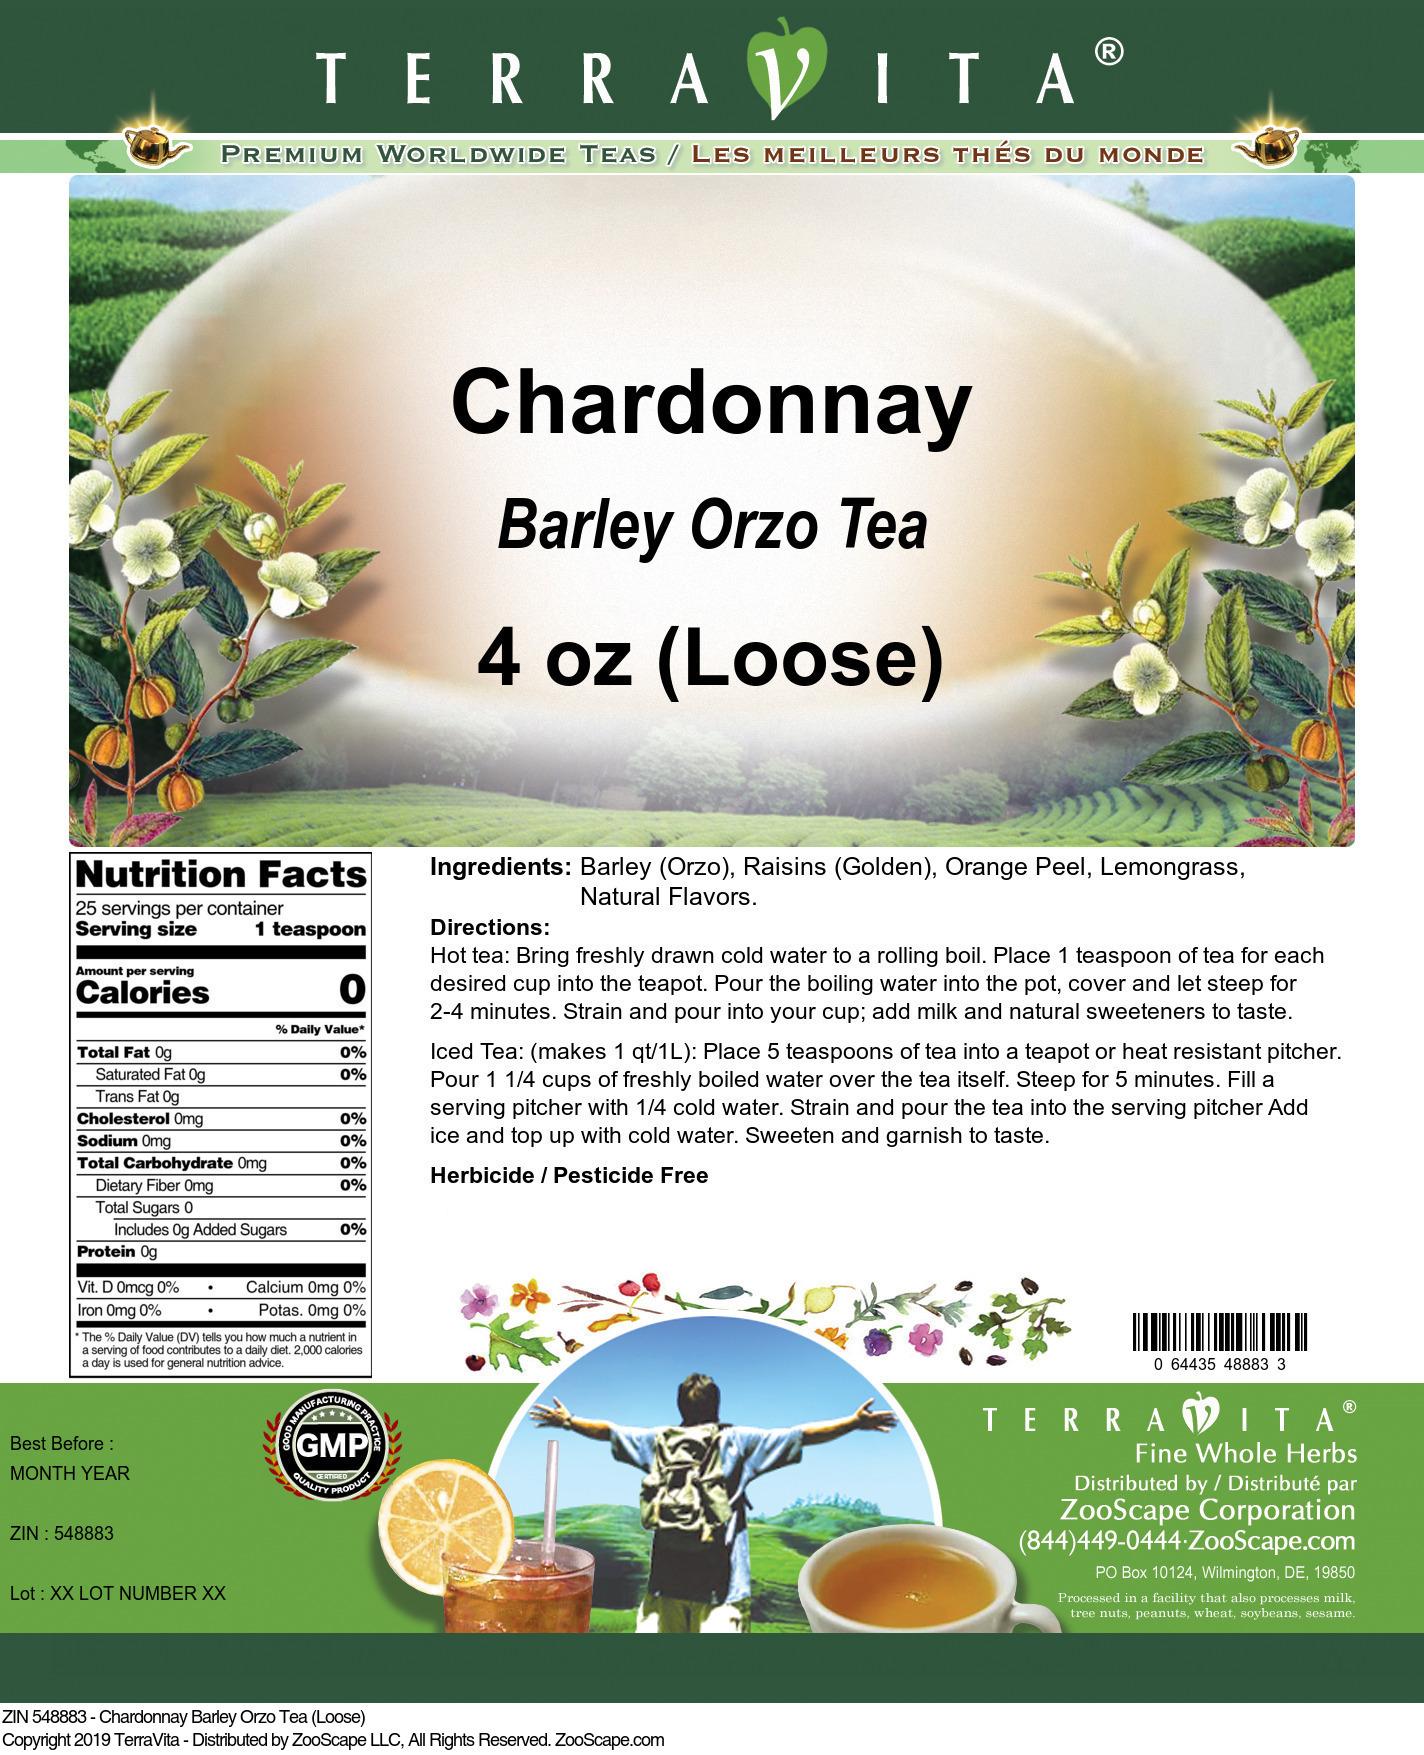 Chardonnay Barley Orzo